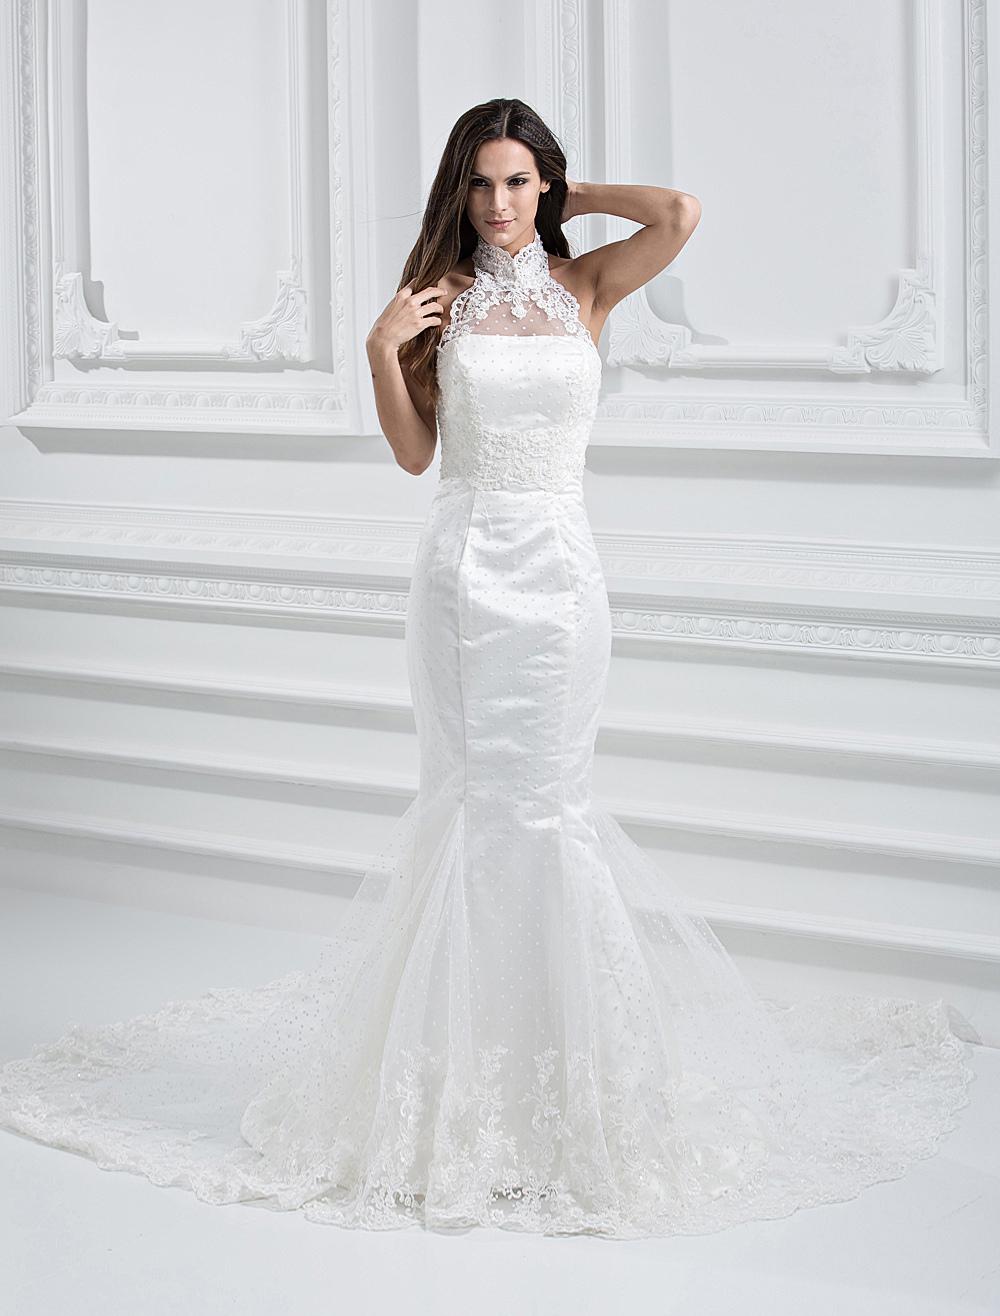 Elegant White Net Strapless Mermaid Trumpet Column Wedding Dress